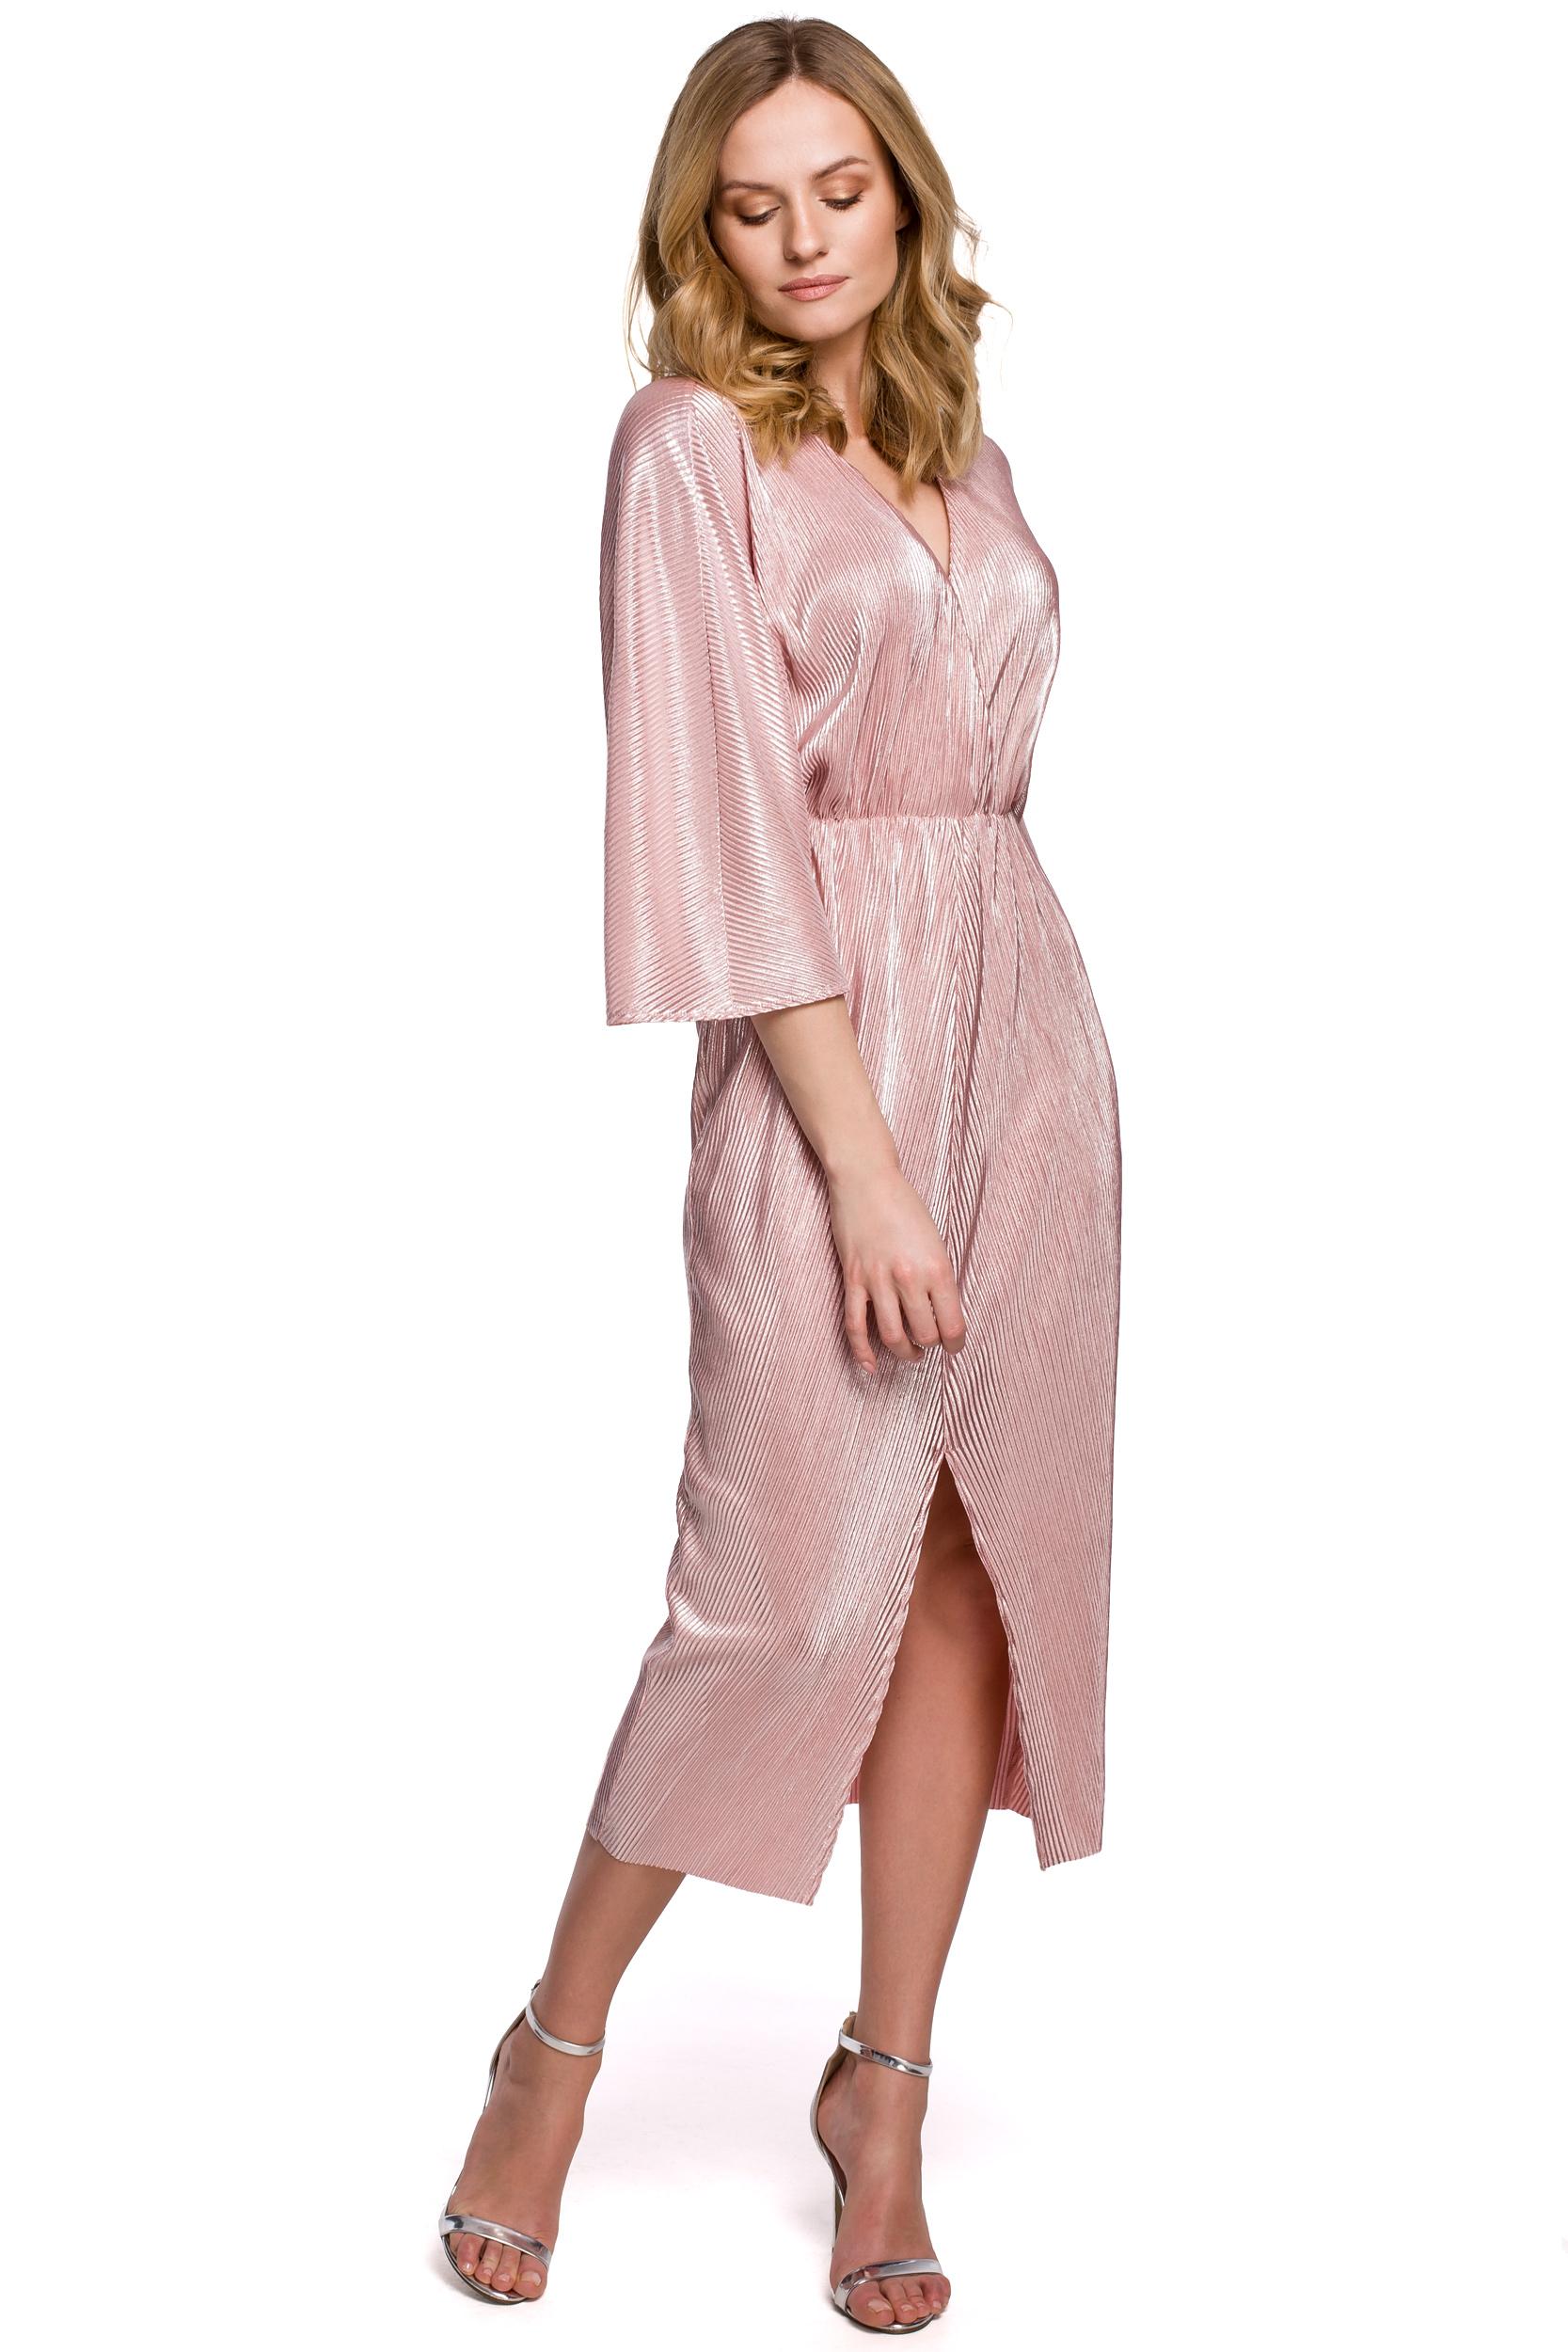 Kimono Rosa Klänning